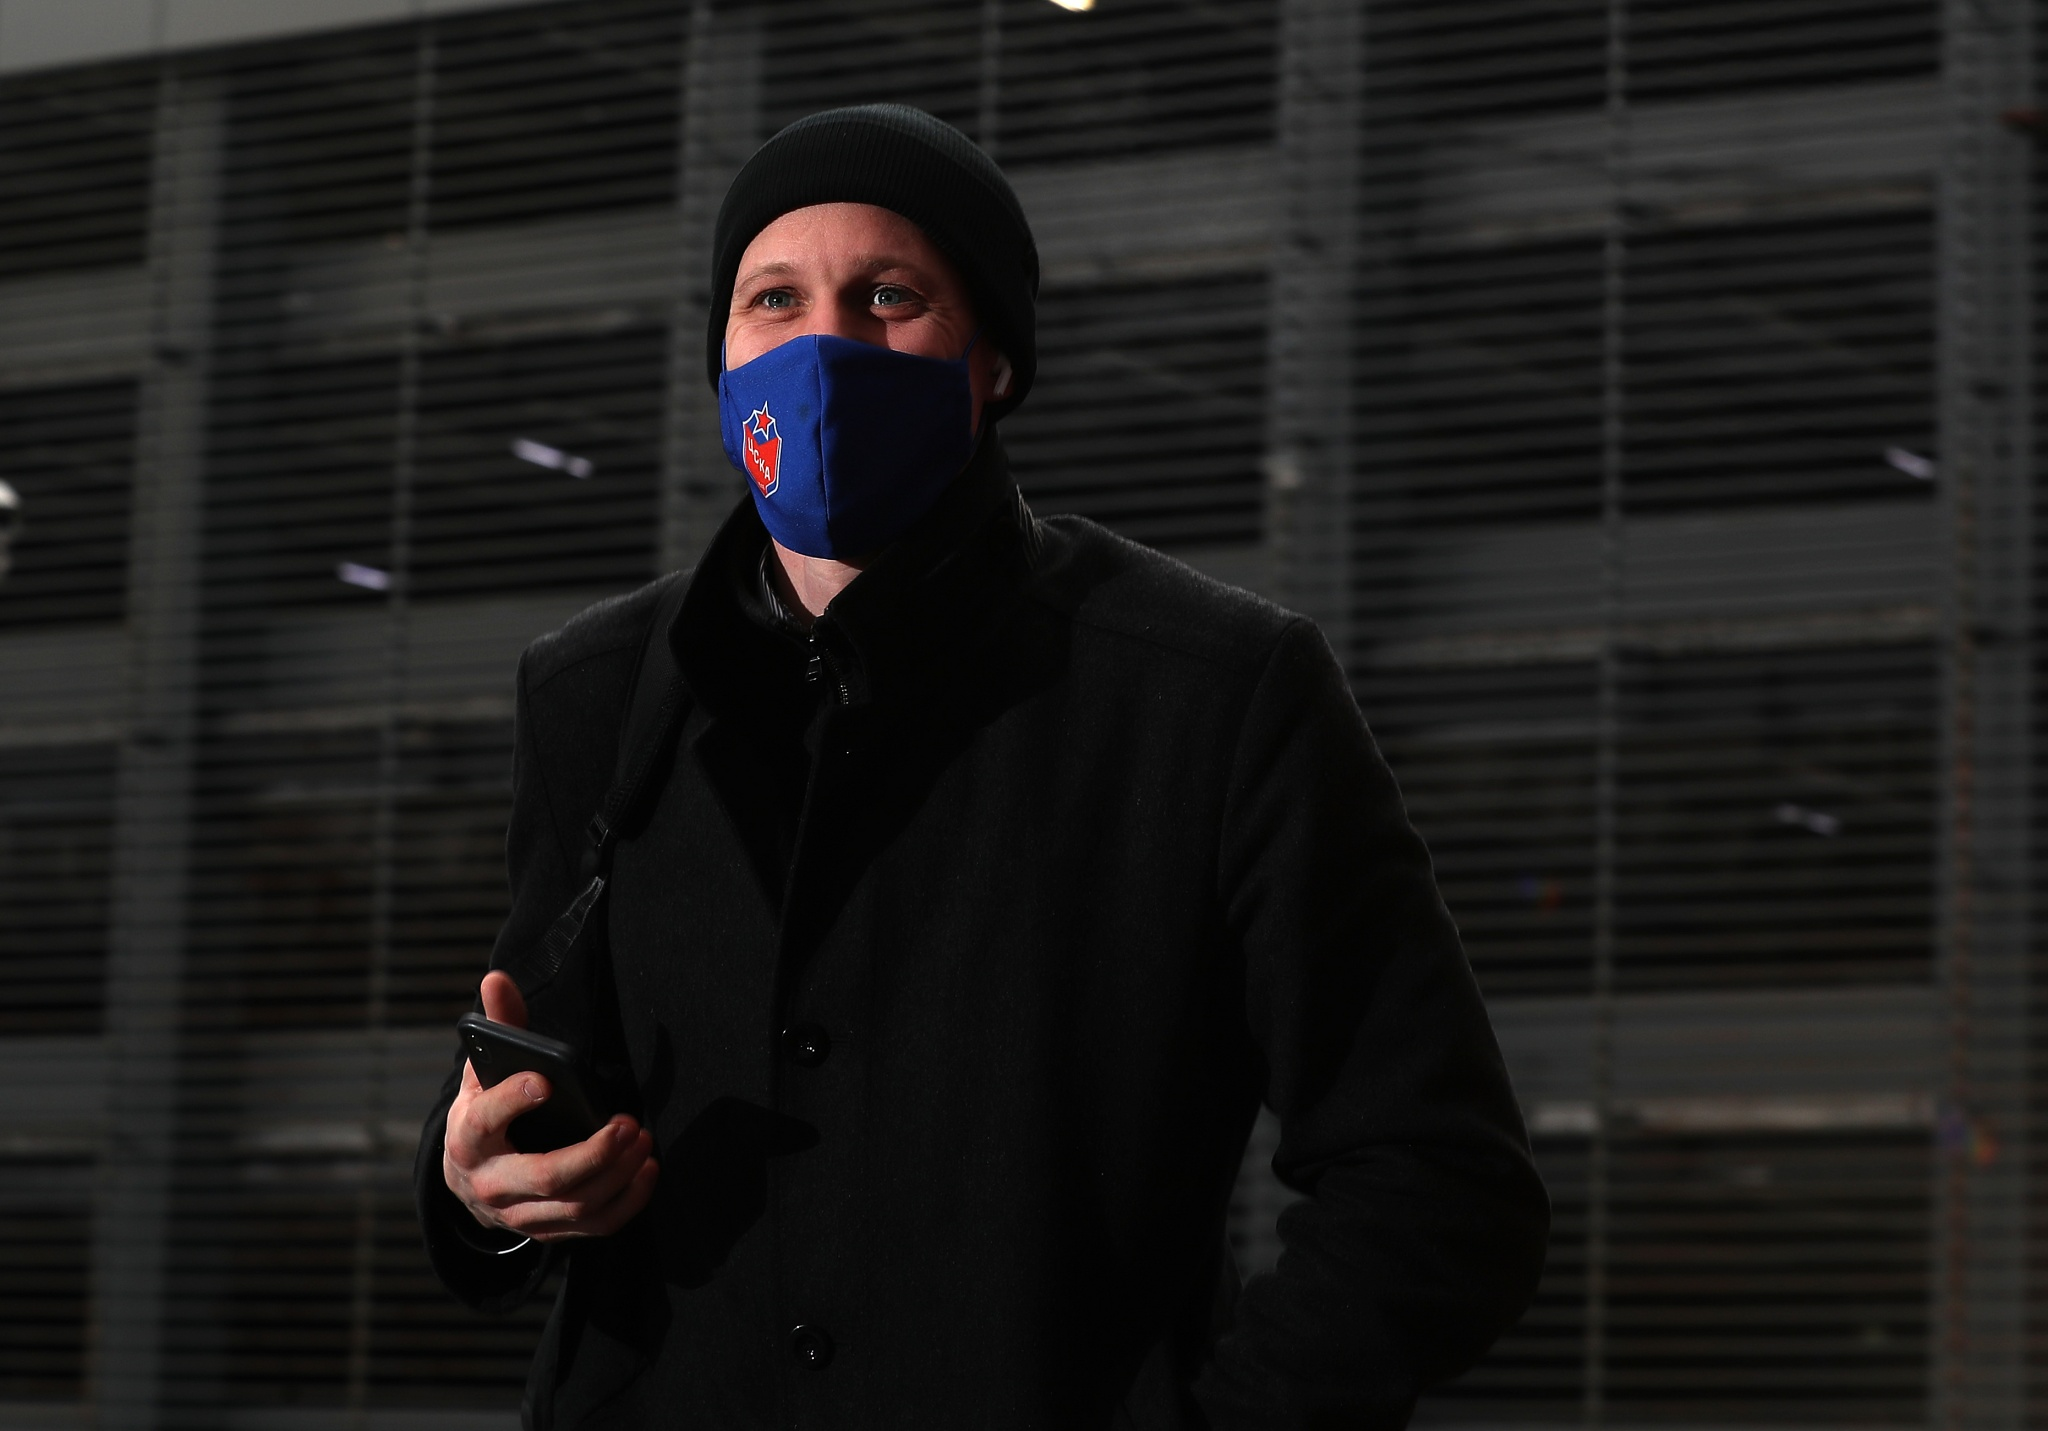 Ларс Юханссон. Фото: Юрий Кузьмин